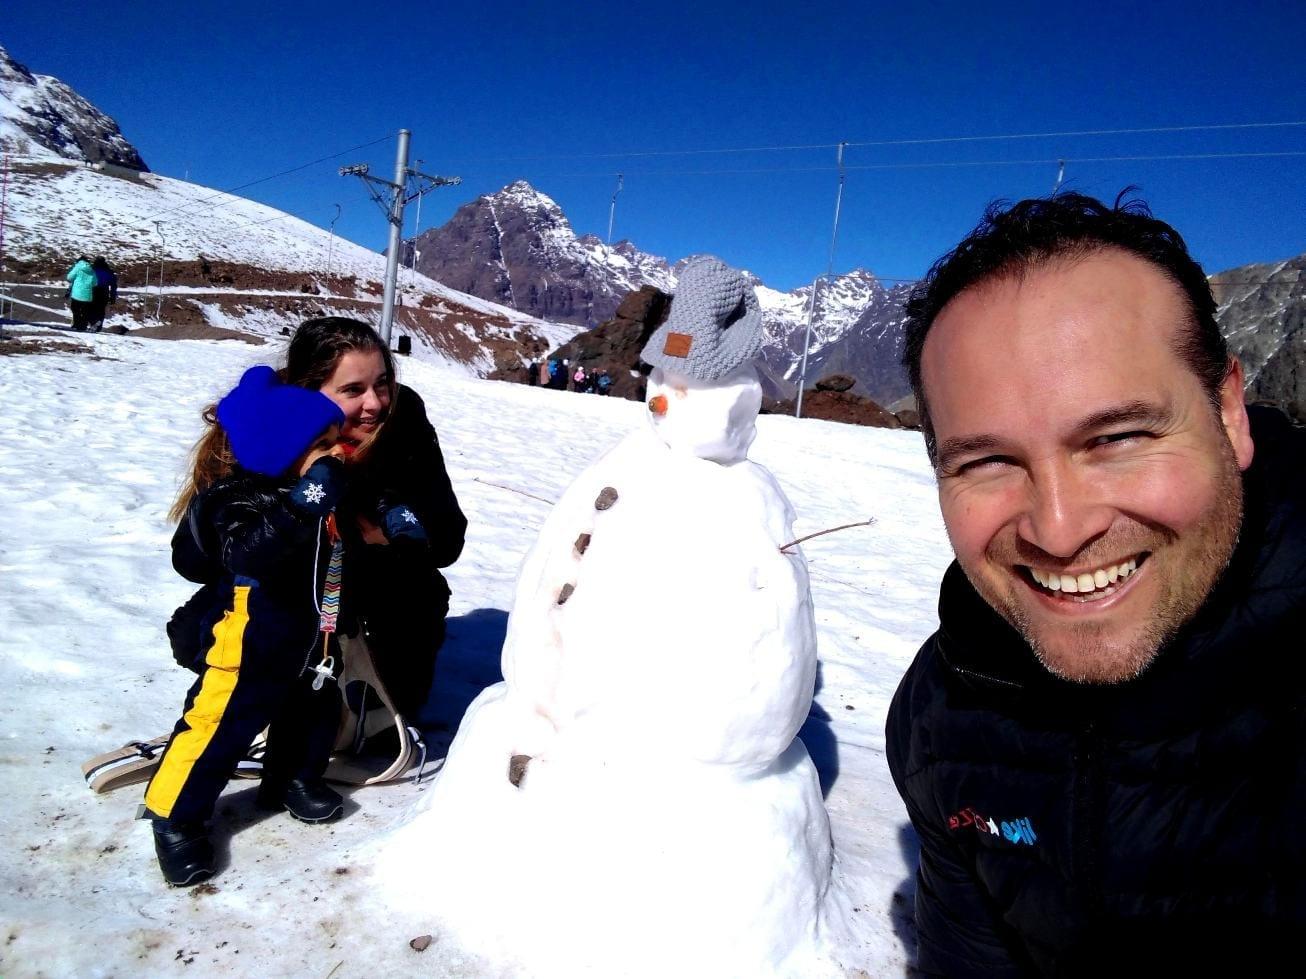 neve Centro de ski Portillo, neve, como chegar, passeios, cuesta los caracoles, laguna del Inca paso los libertadores chile